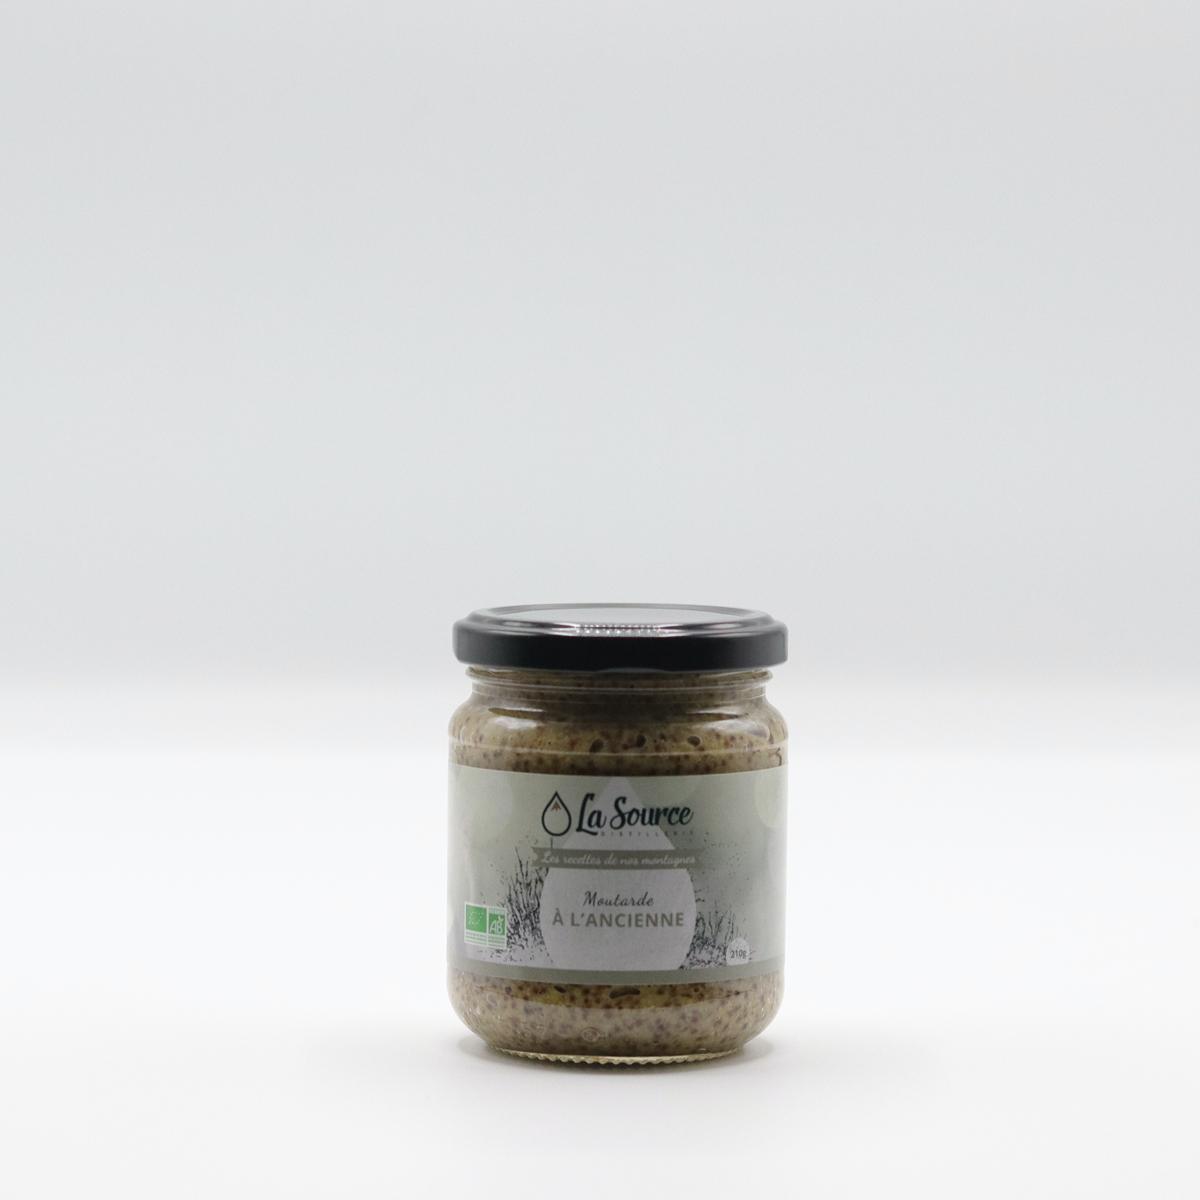 https://www.lasource-distillerie.fr/wp-content/uploads/2021/09/moutarde-a-lancienne.jpg